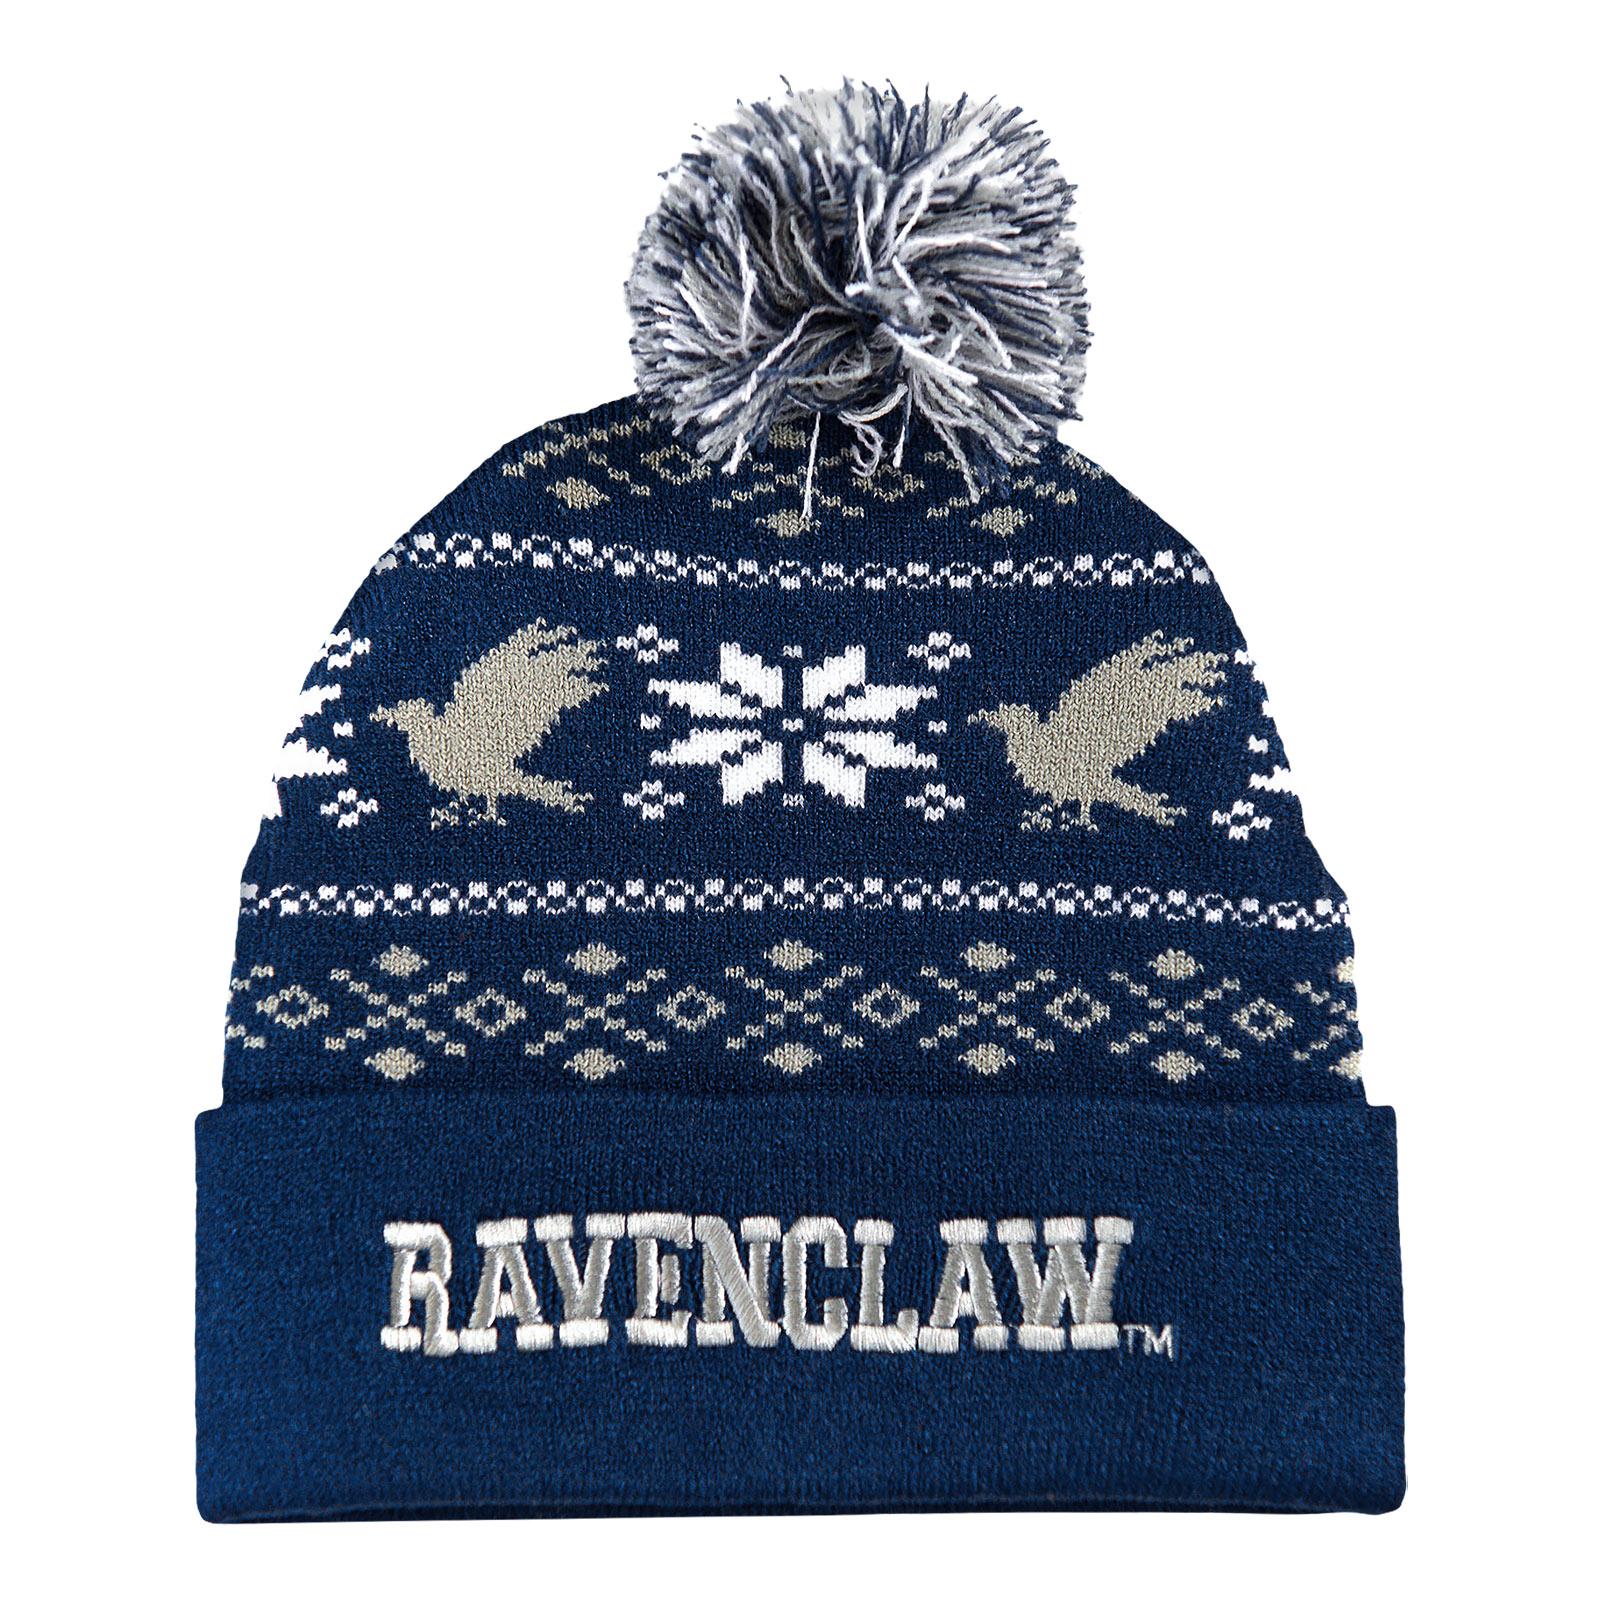 Harry Potter - Ravenclaw Norwegermütze blau